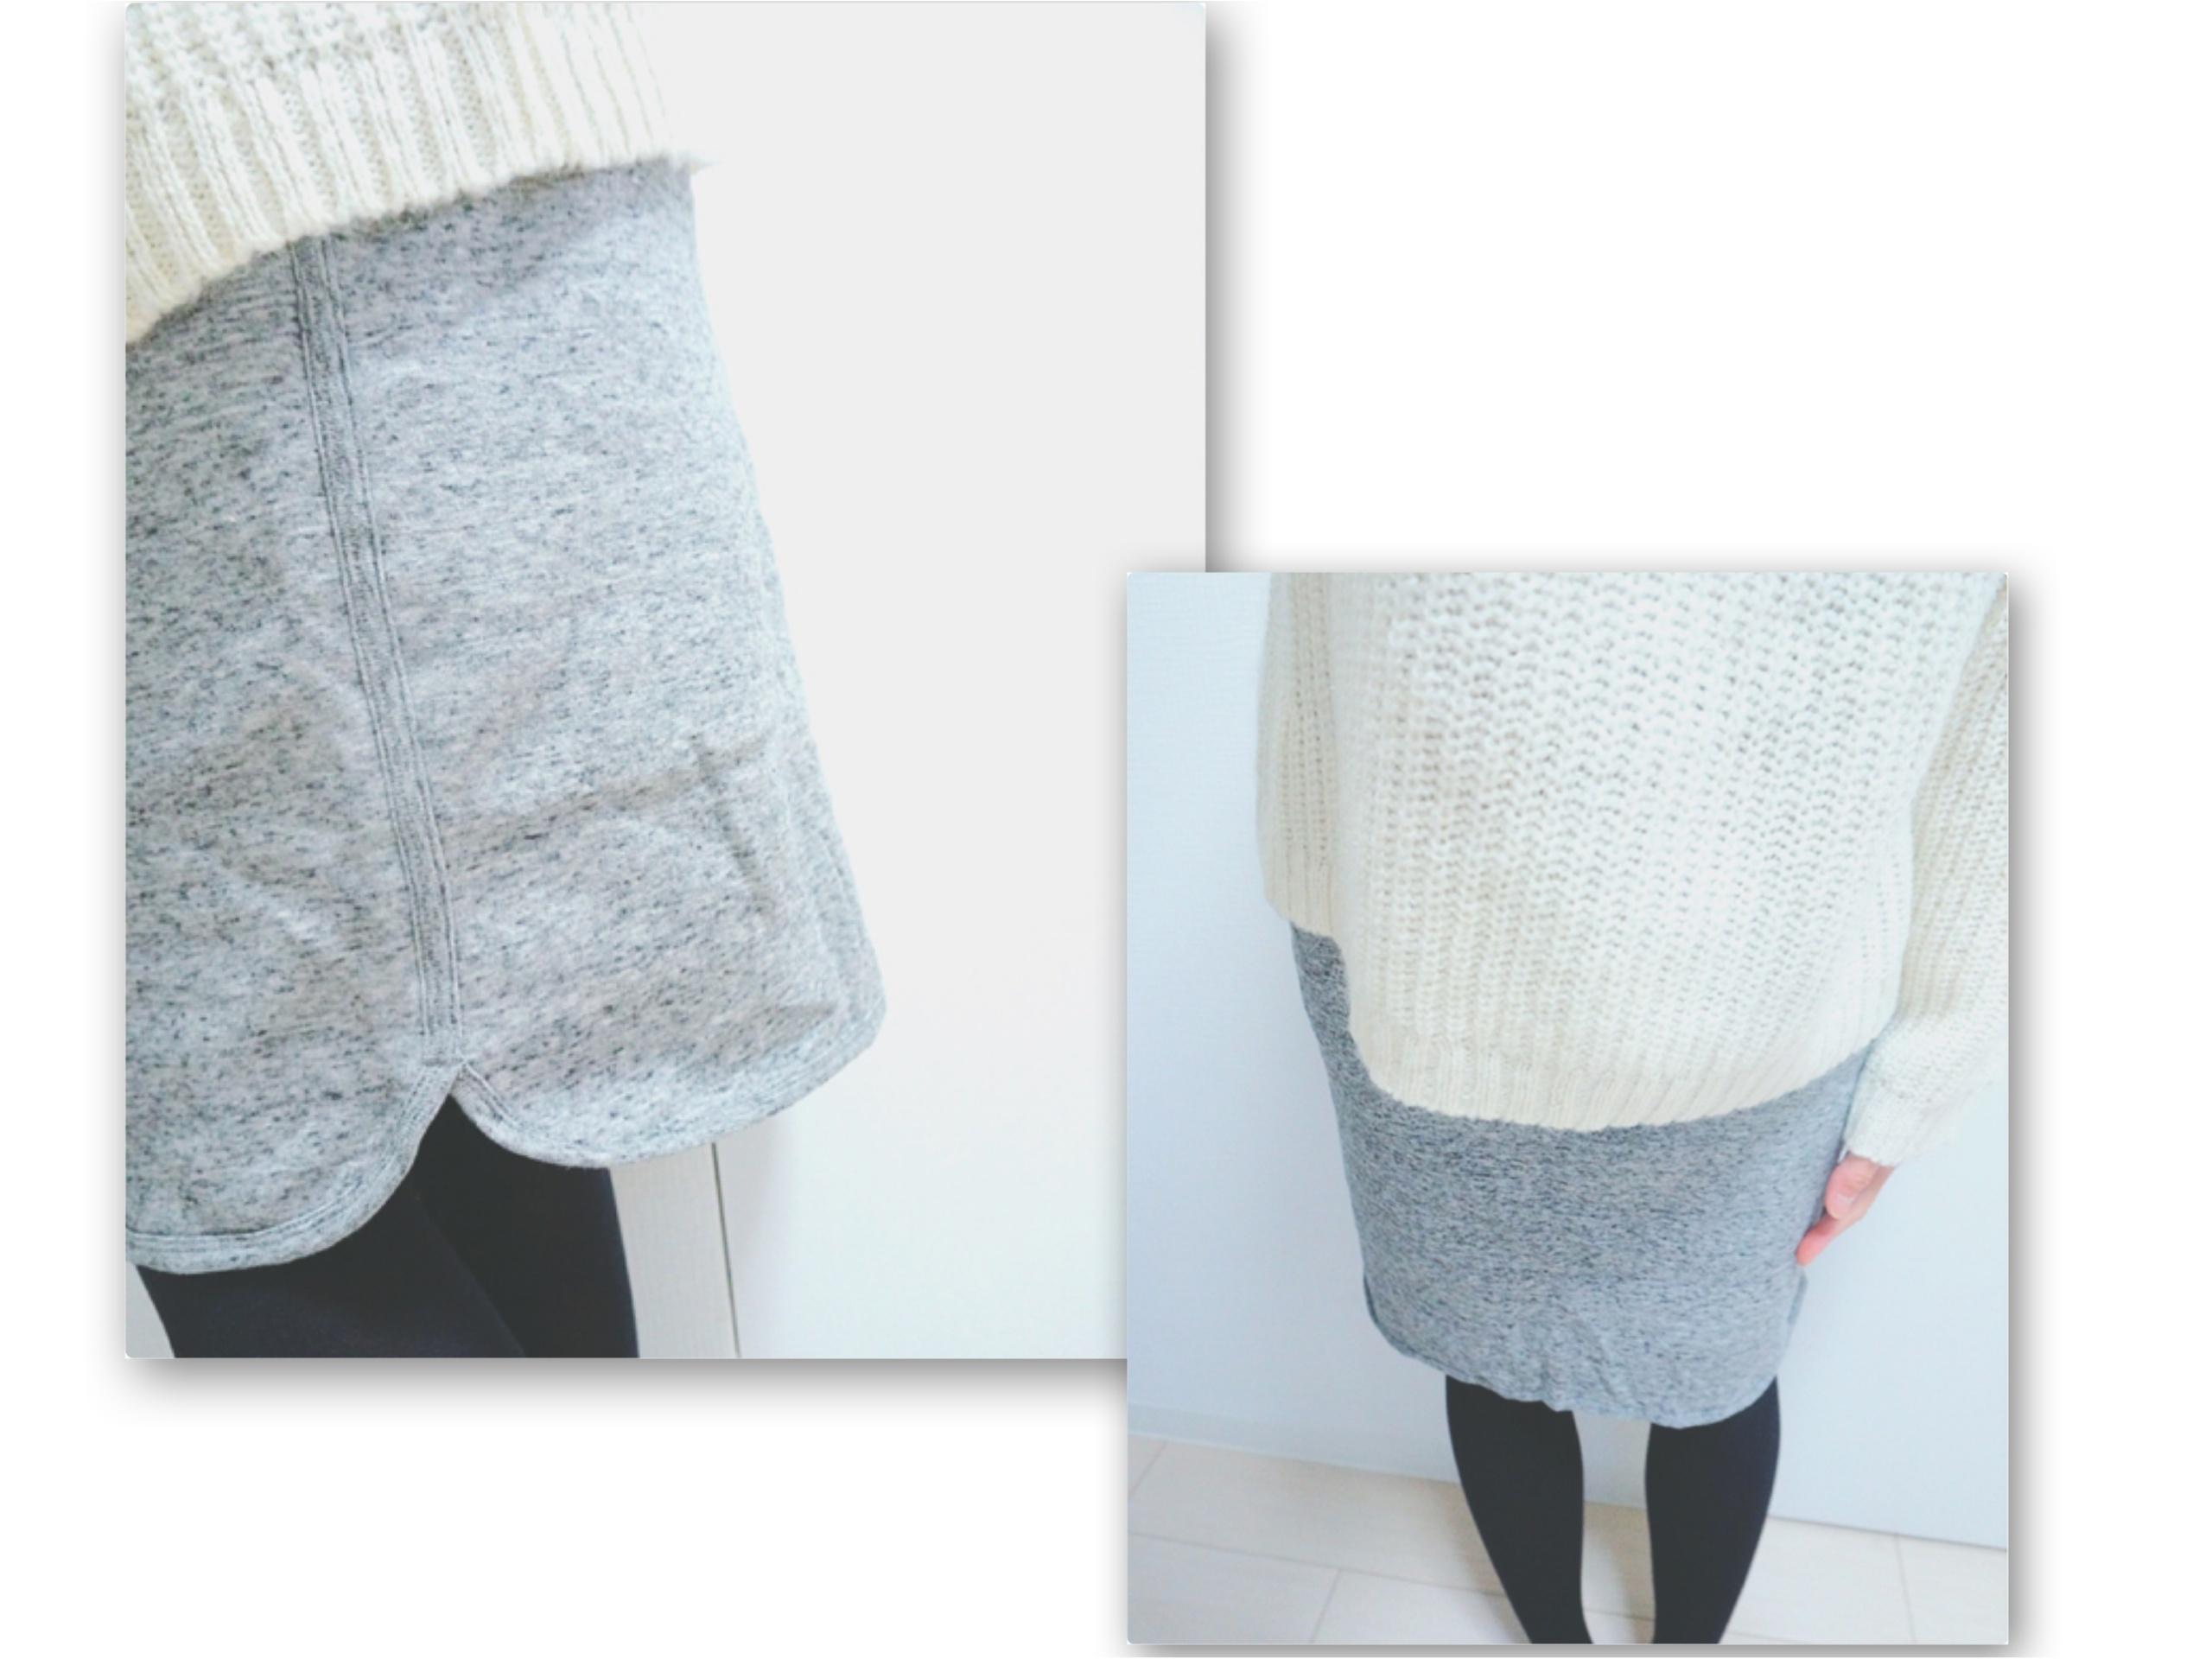 【UNIQLO誕生感謝祭第3弾!】寒い冬もこれで暖か&快適に❤️着回しもしやすい《優秀スカート》を色ち買い!_6